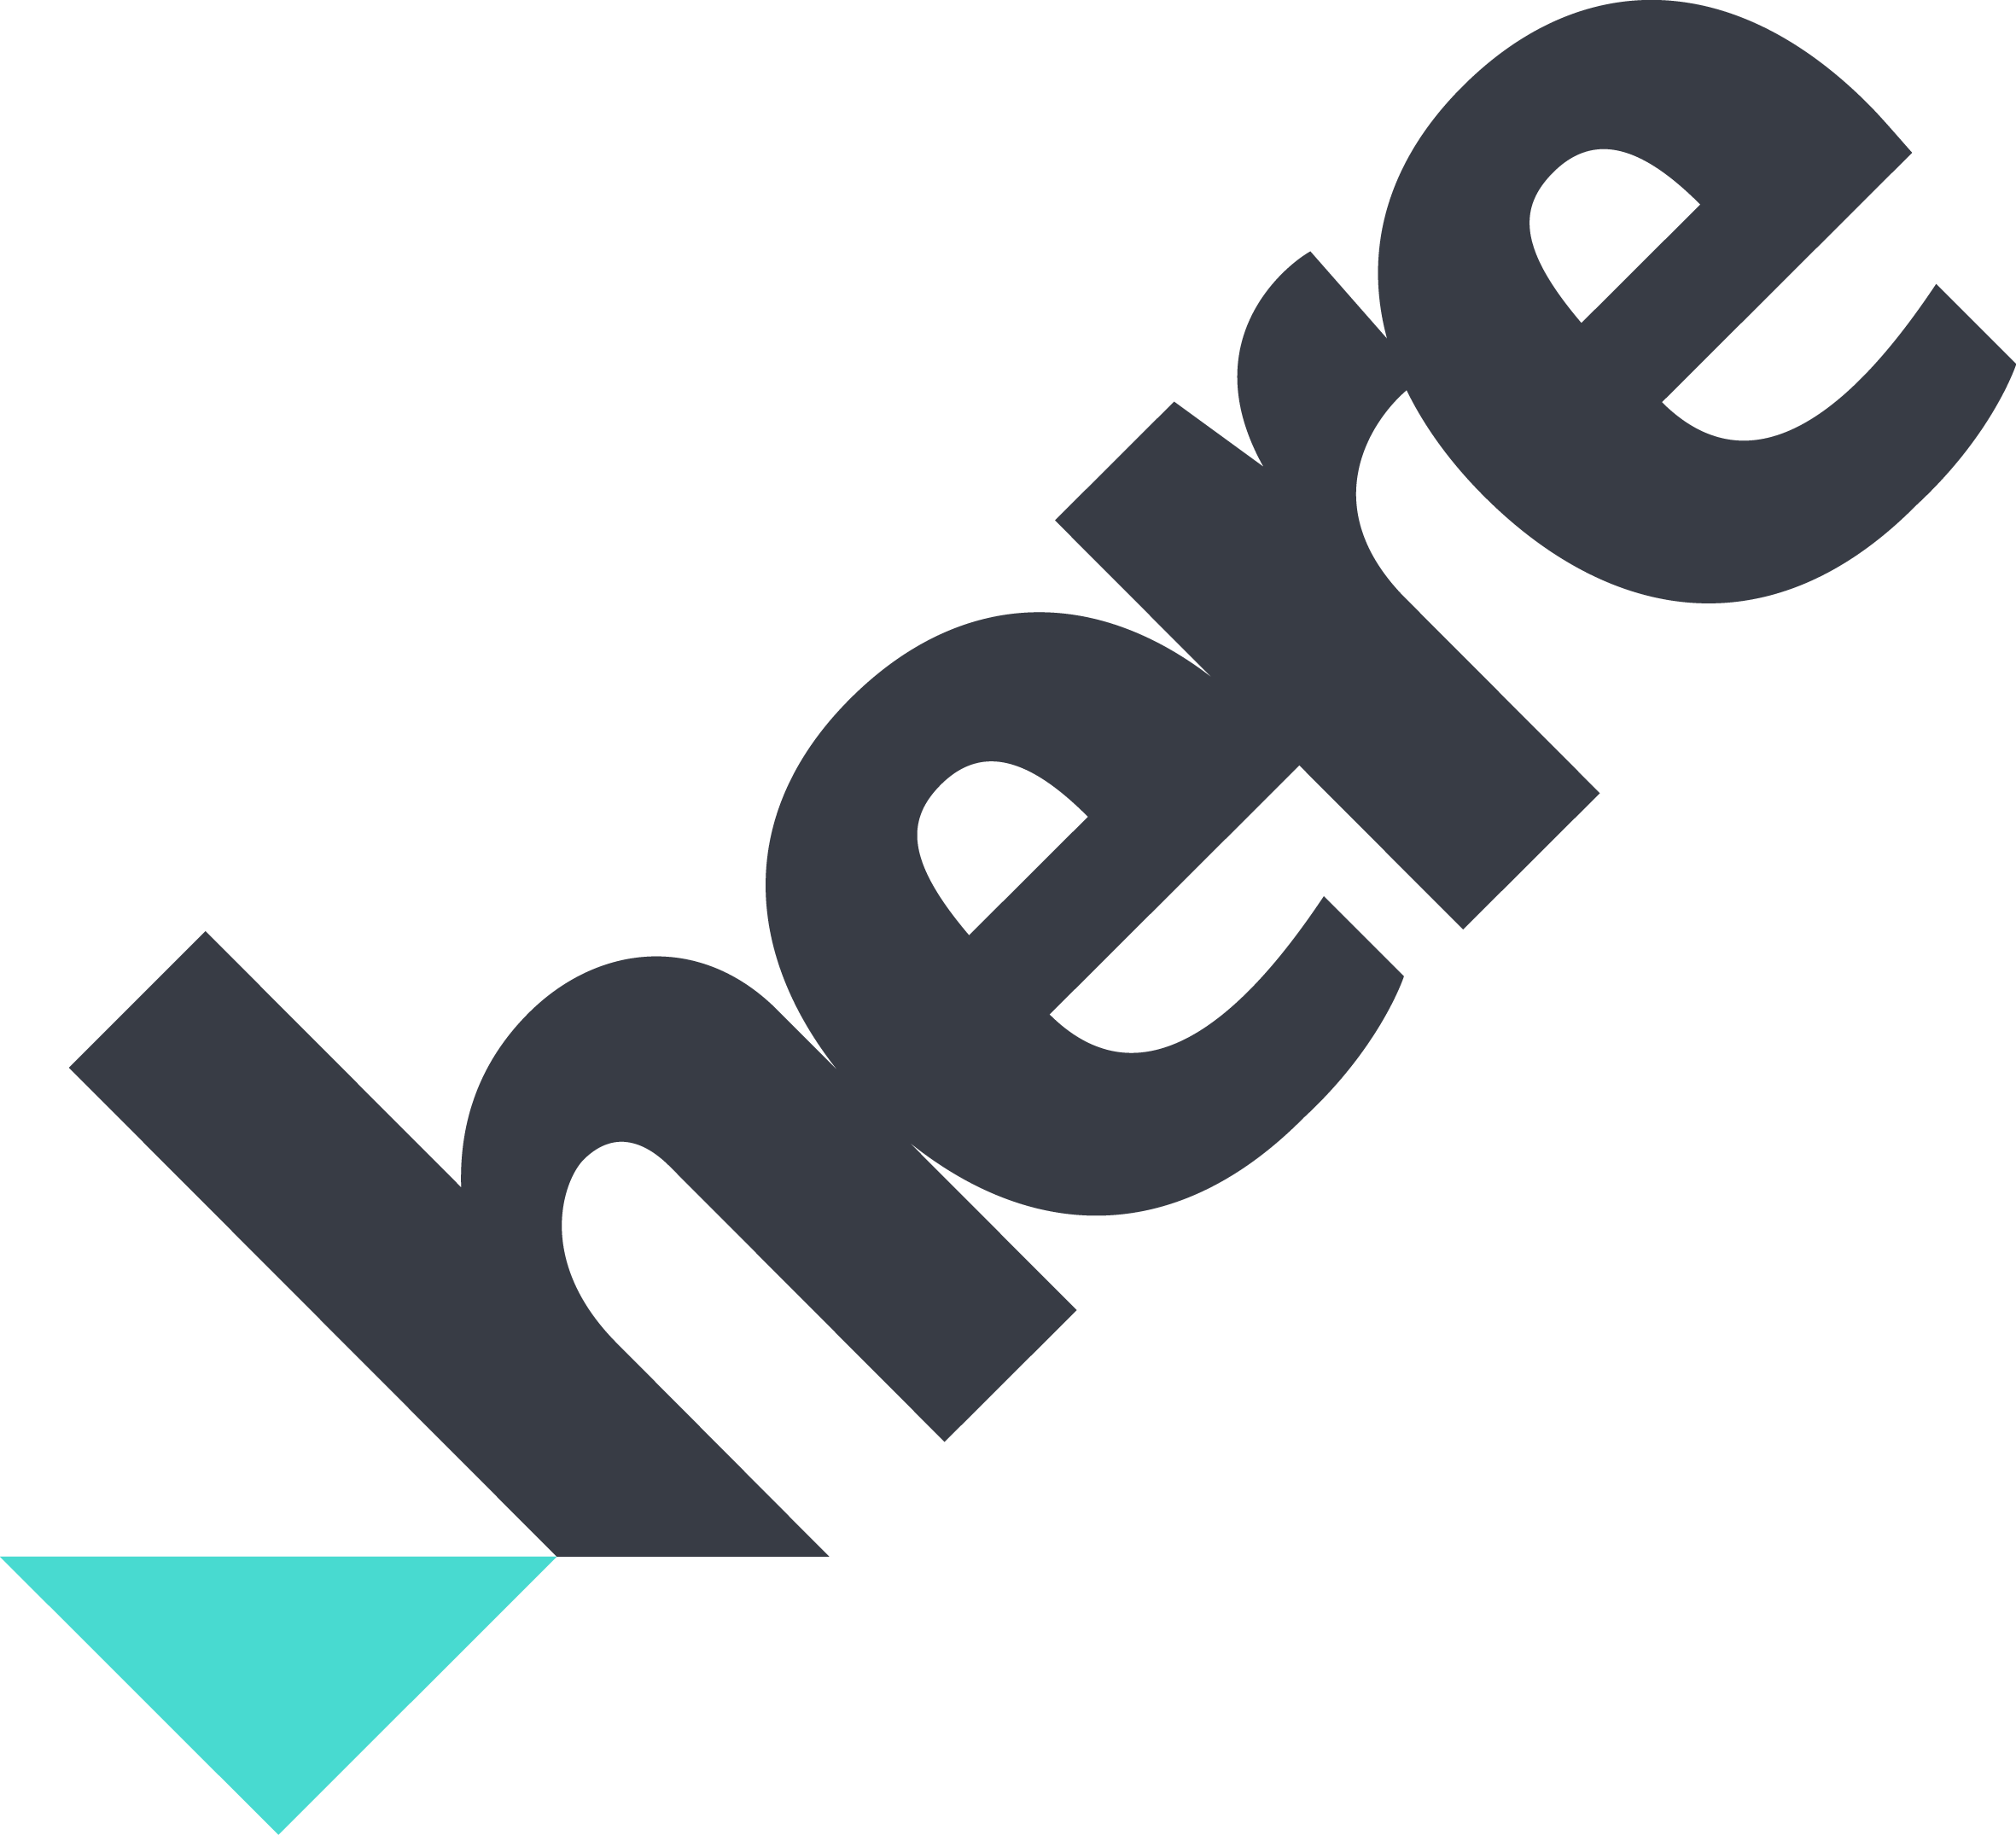 HERE_Logo_2016_V01_0_sRGB.png